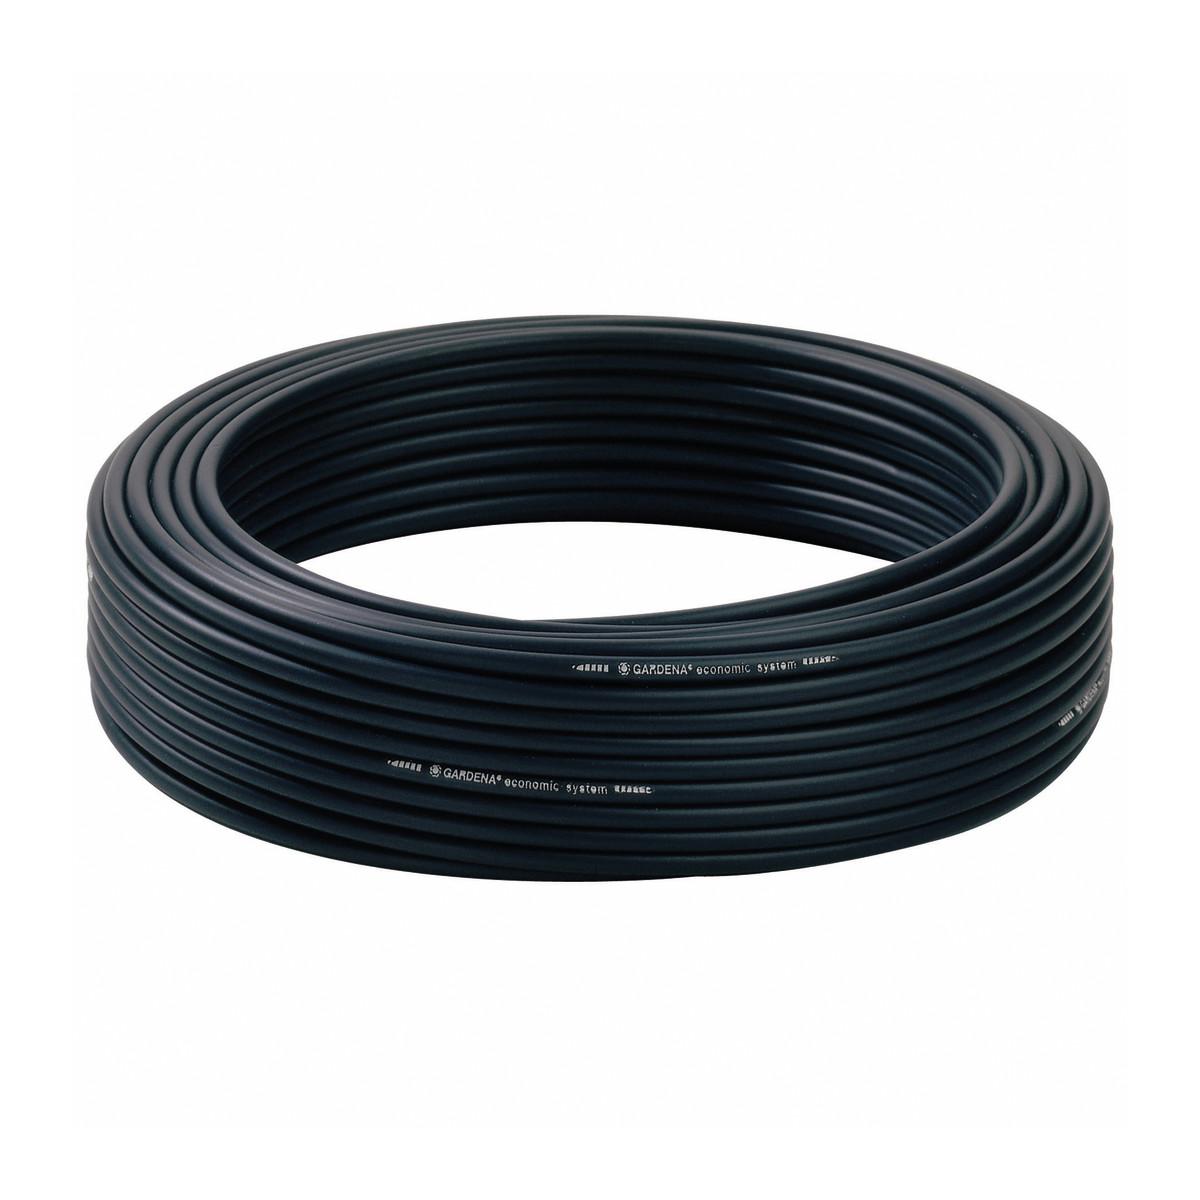 Axel garden tubo irrigazione spiralato pu indeformabile for Tubo irrigazione leroy merlin